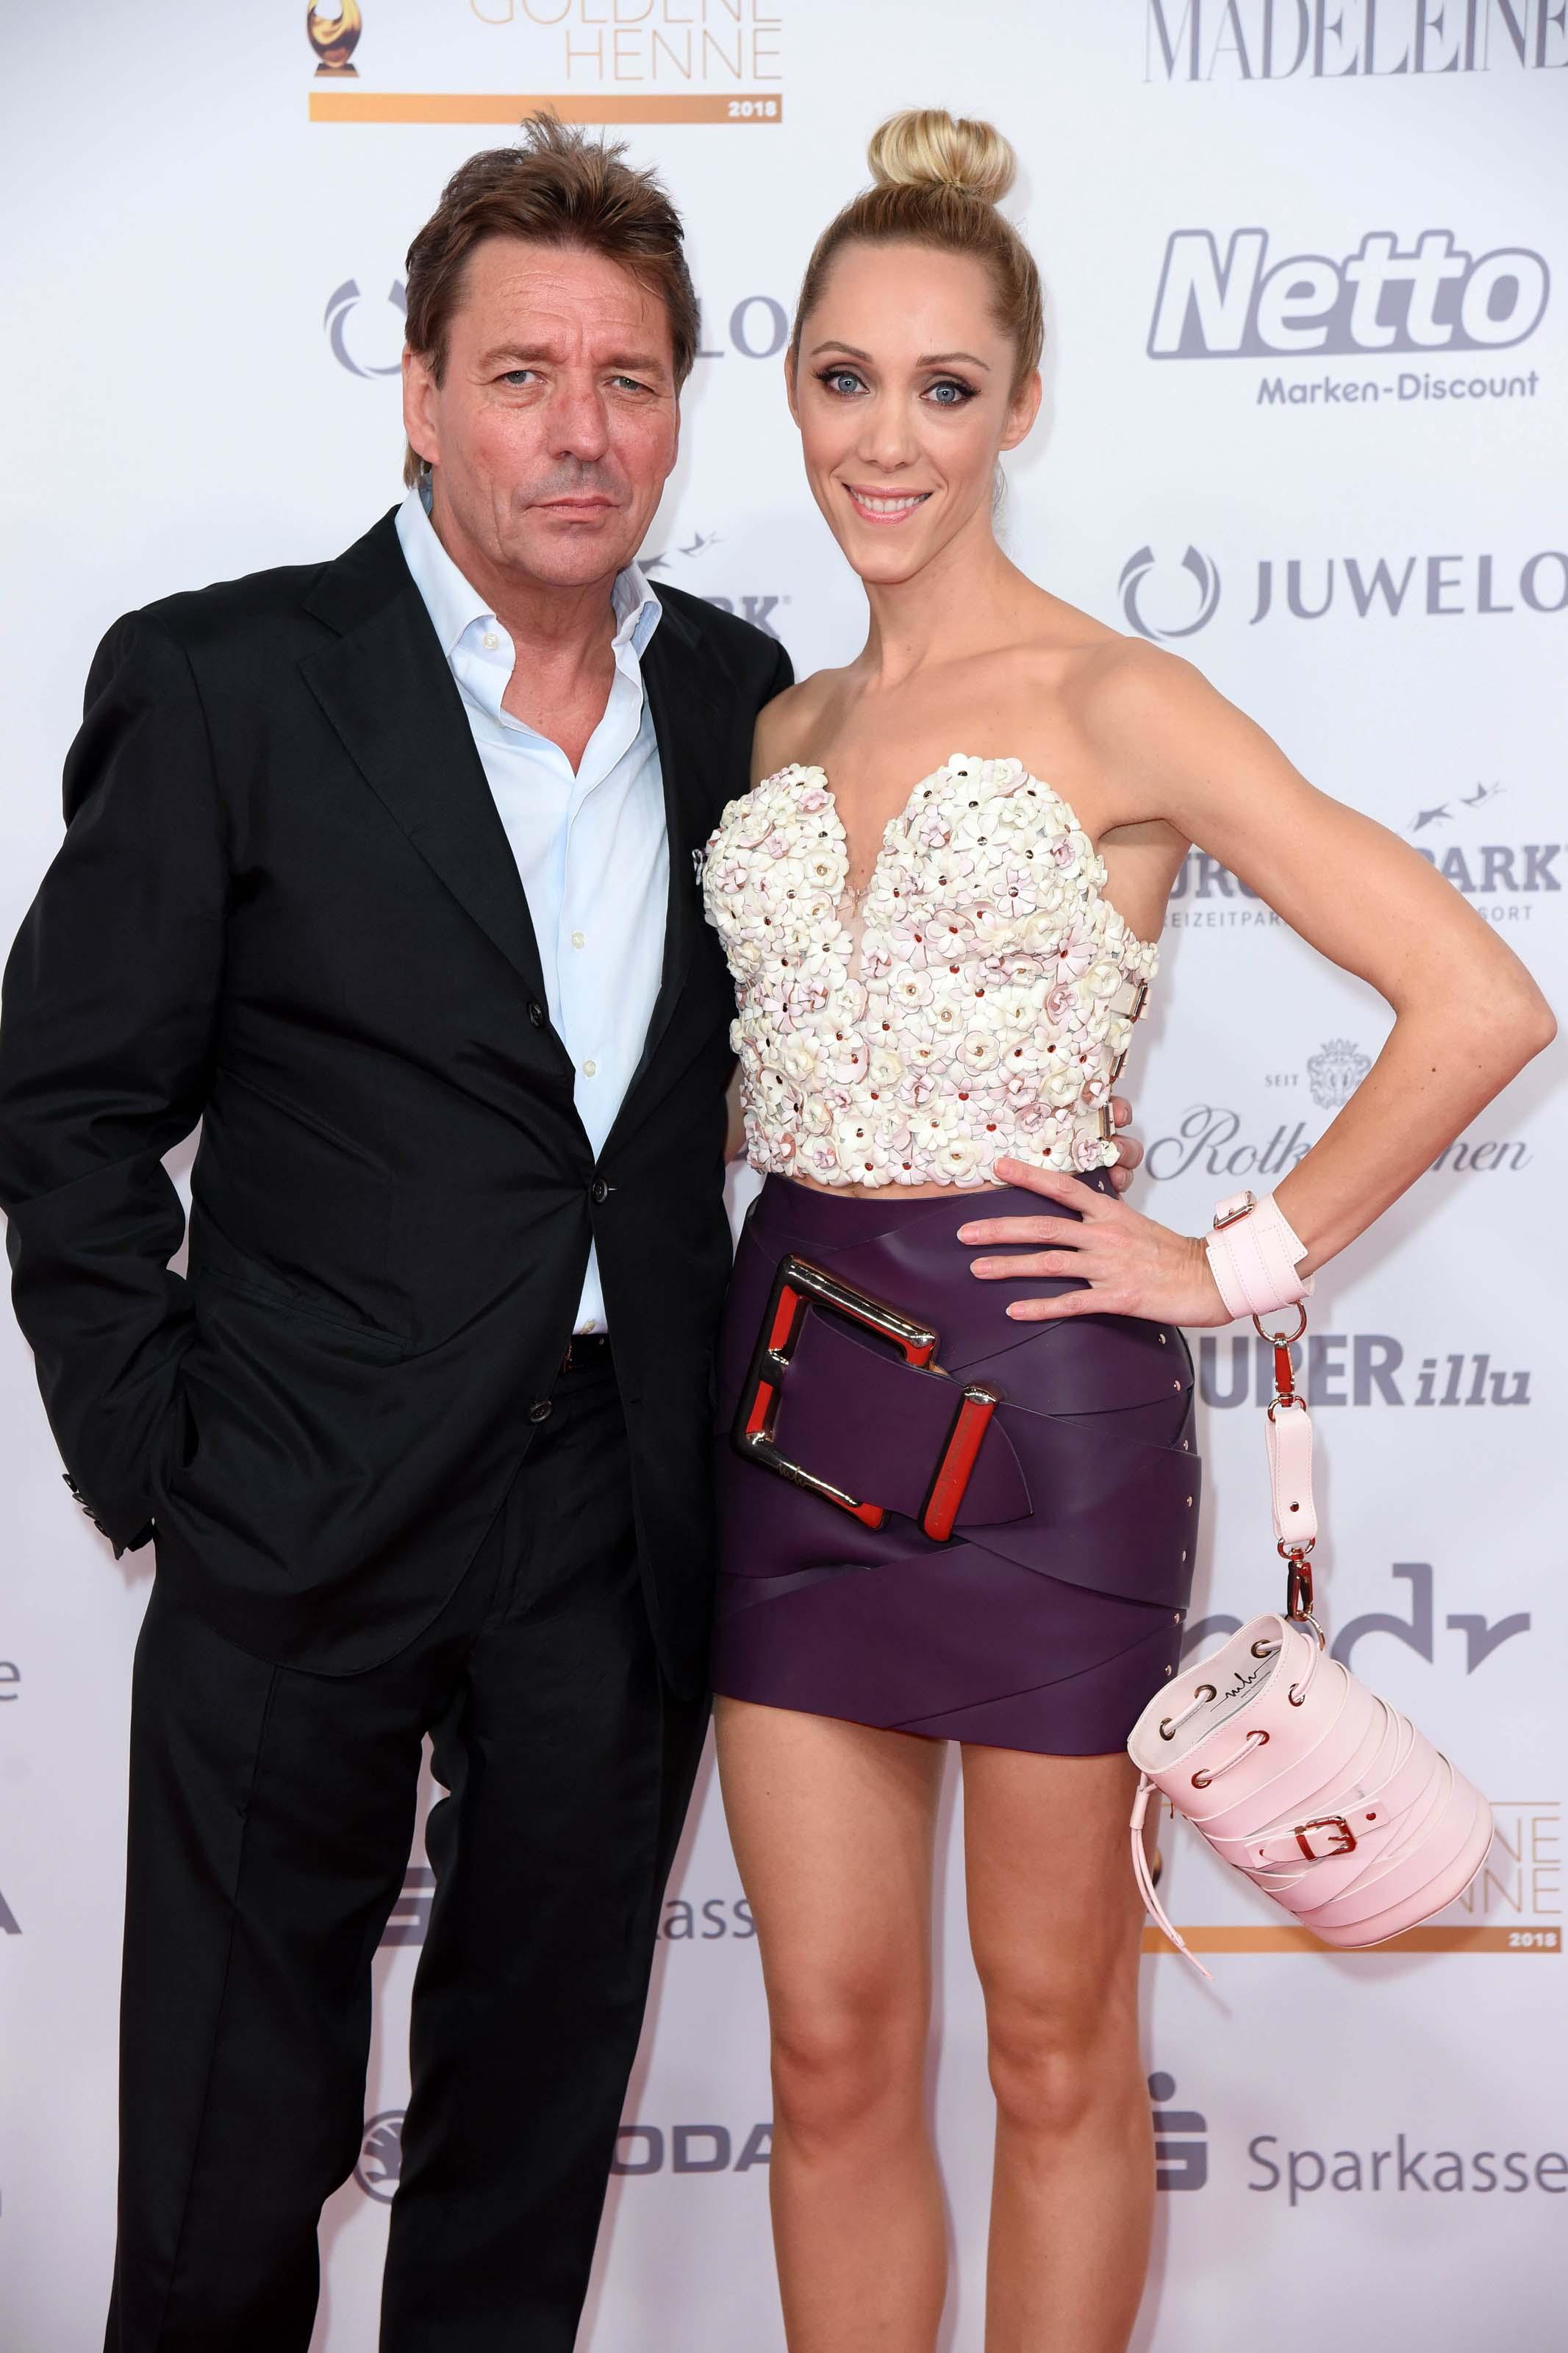 Kerstin Merlin & Melanie Wolf attend Goldenen Henne award show